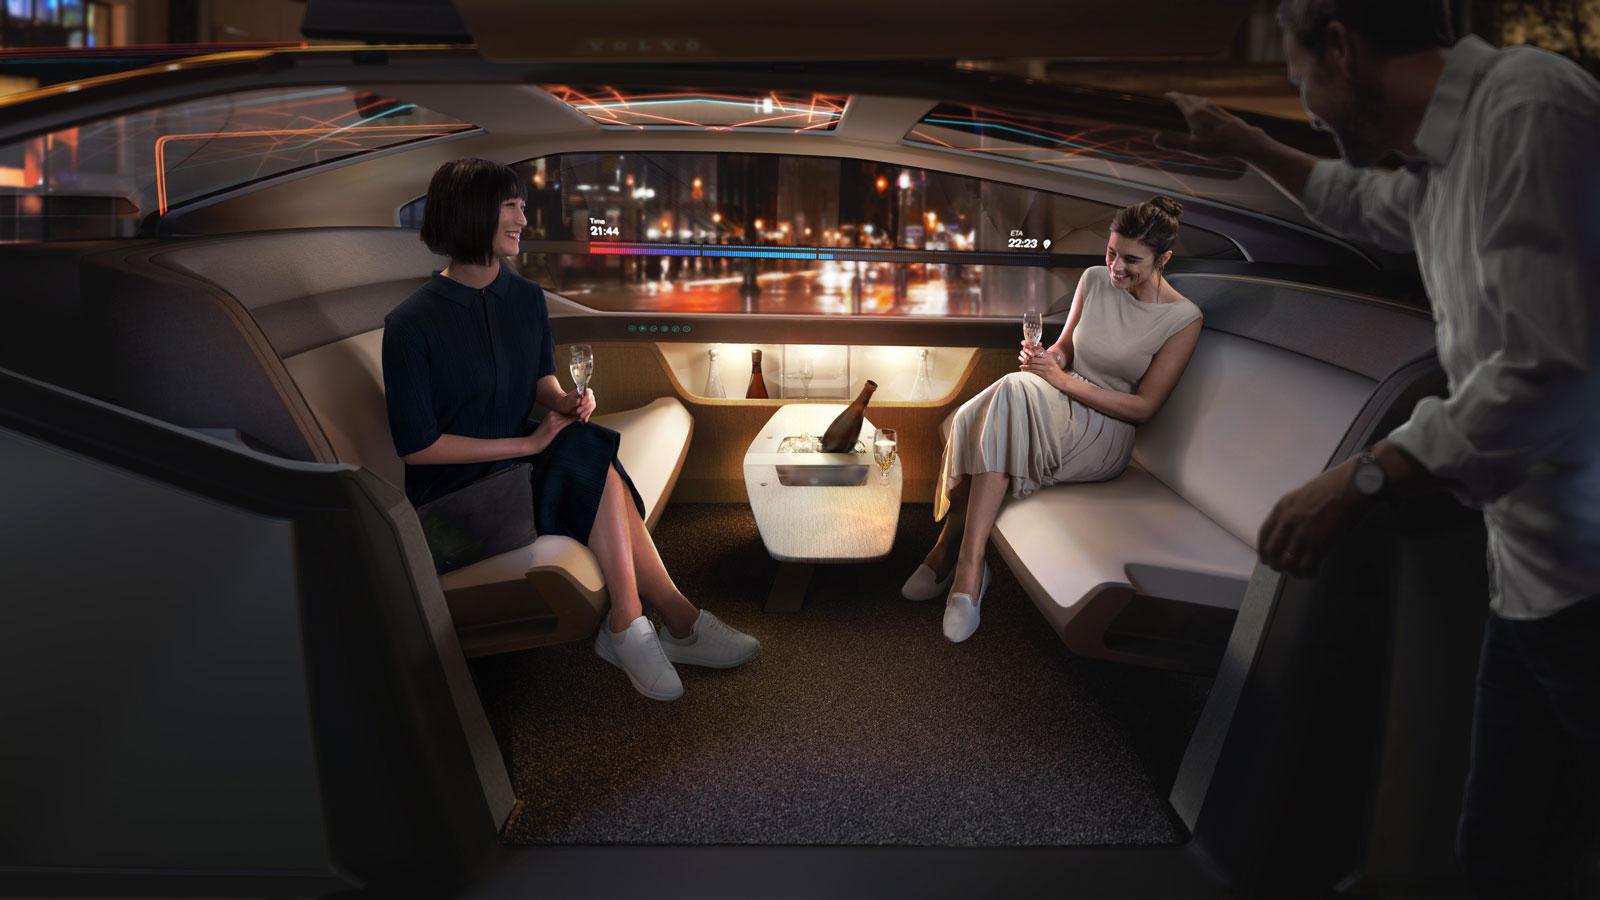 Volvo-360c-Autonomous-Concept-Interior-Party.jpg